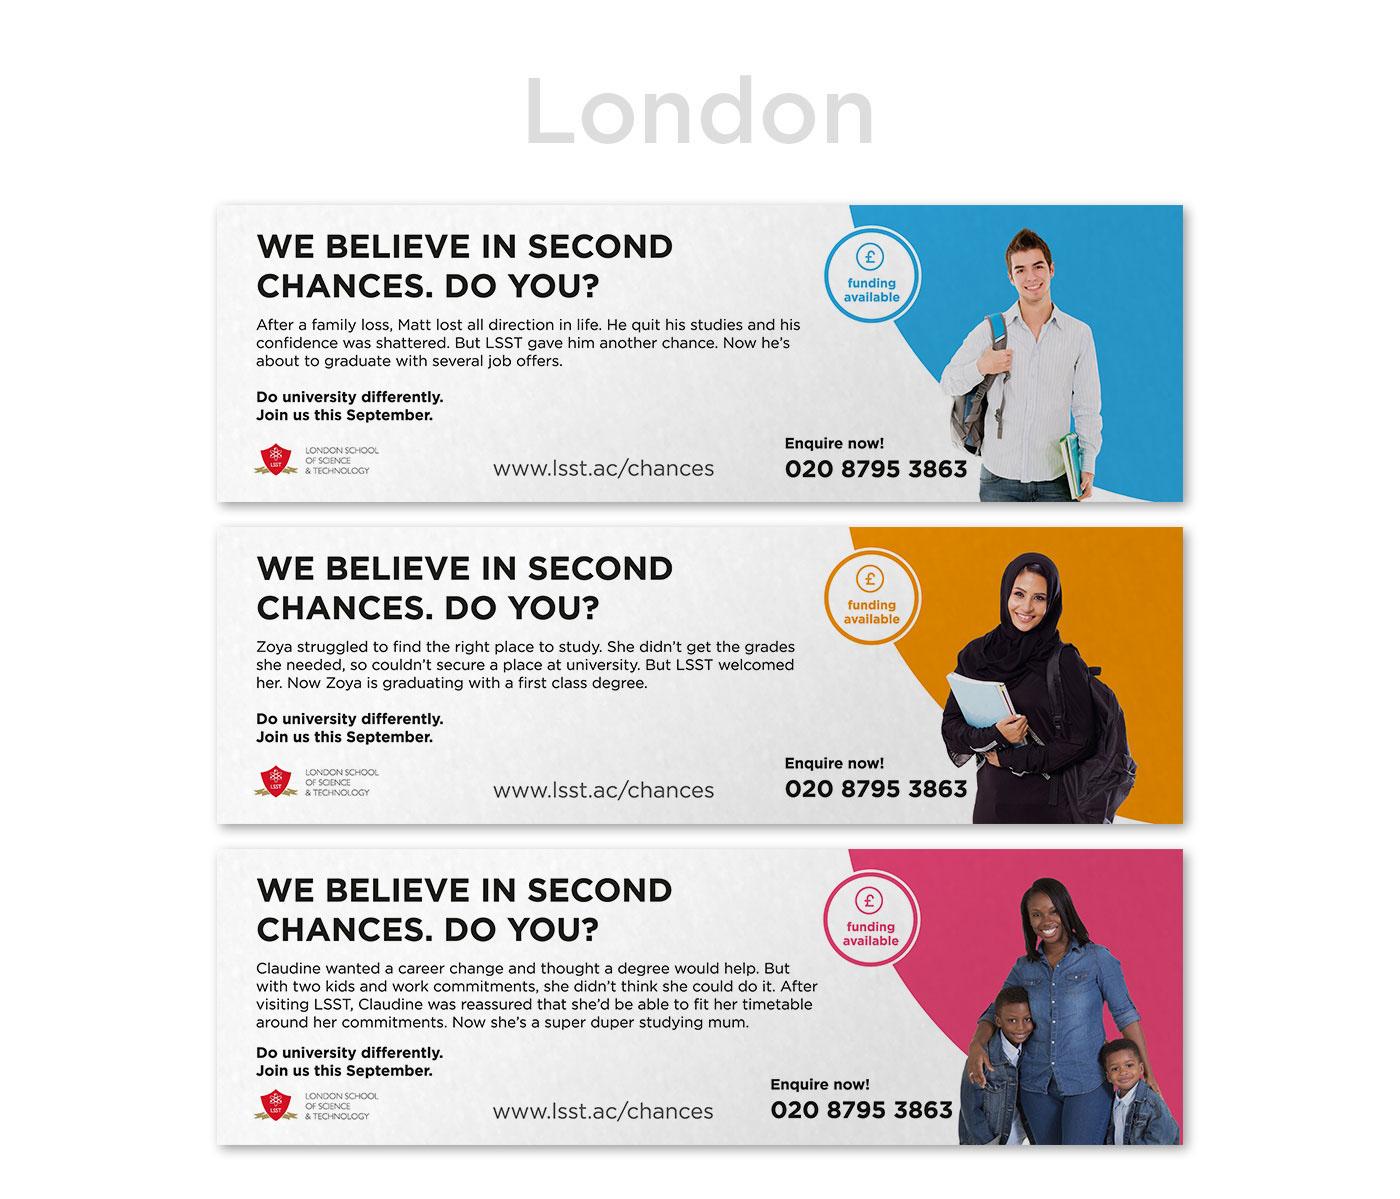 campaign recruitment college University advert marketing